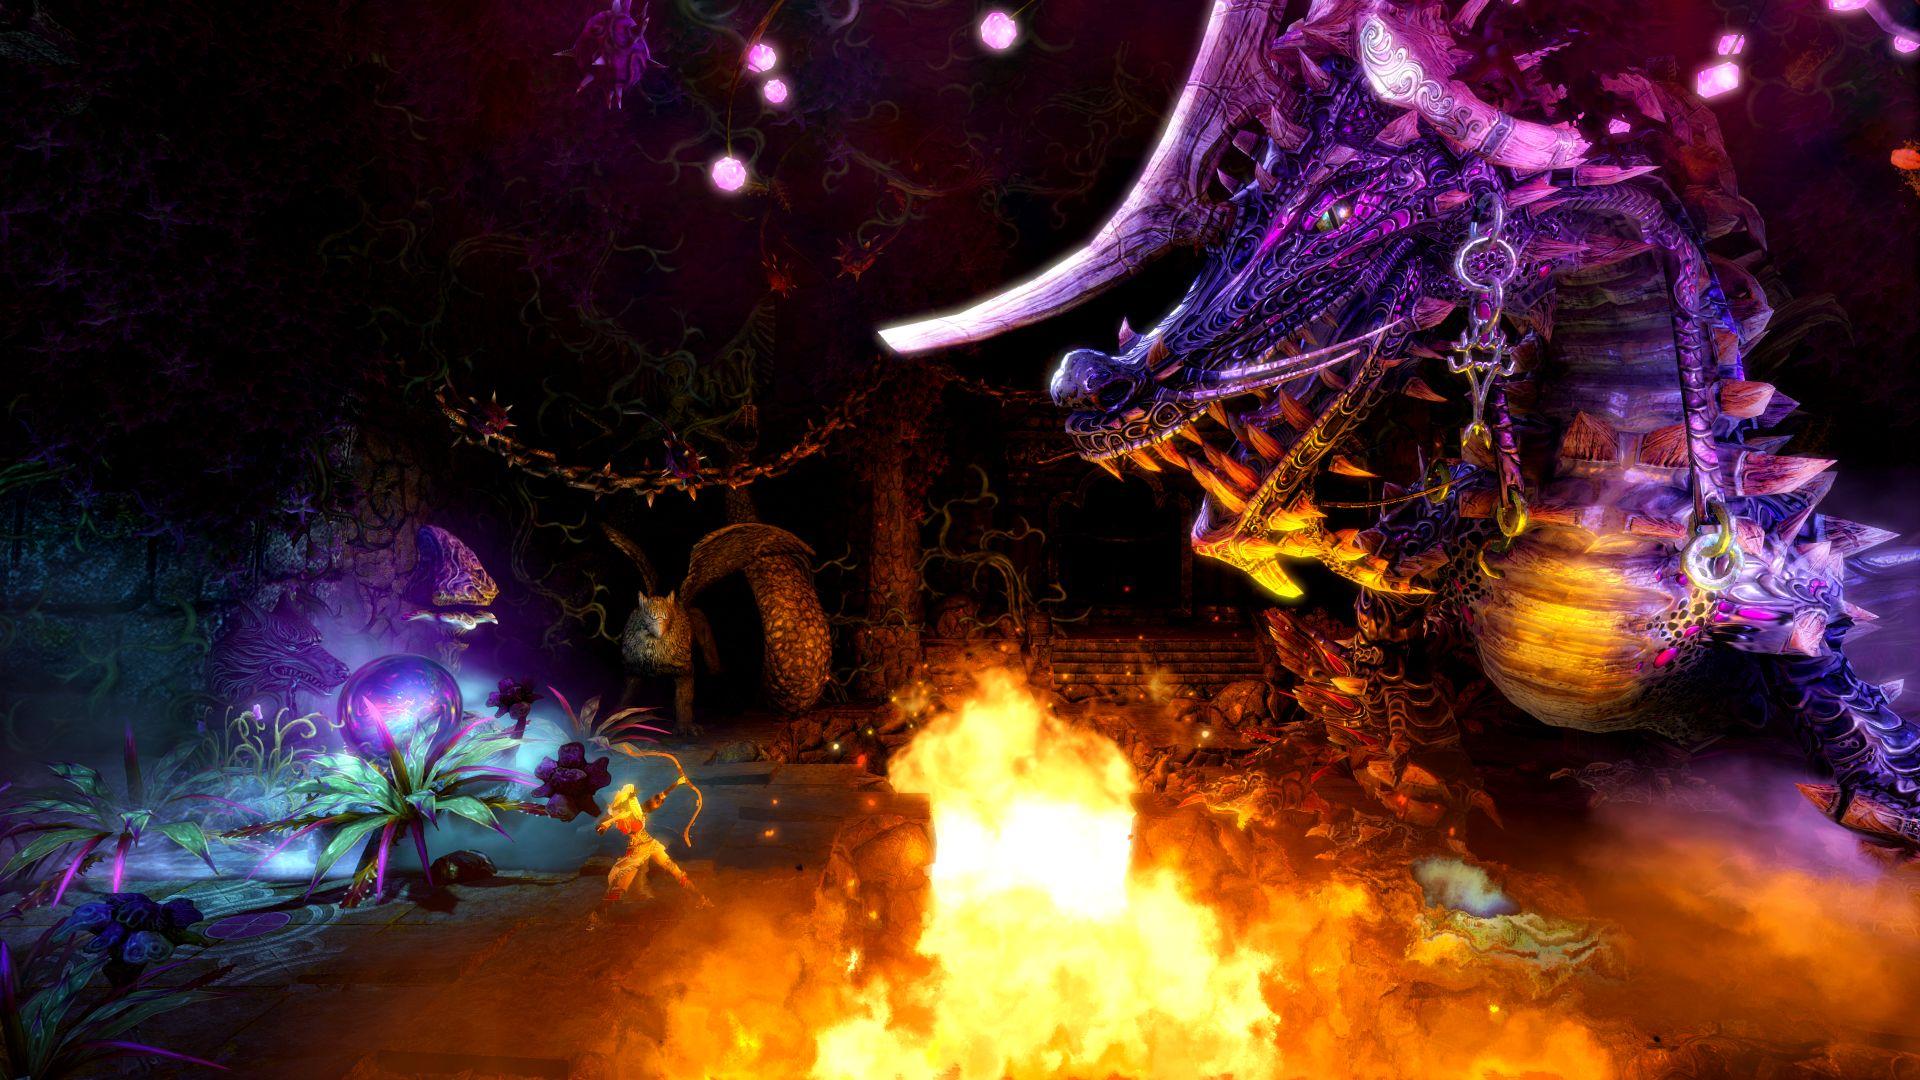 Spyro reignited trilogy download